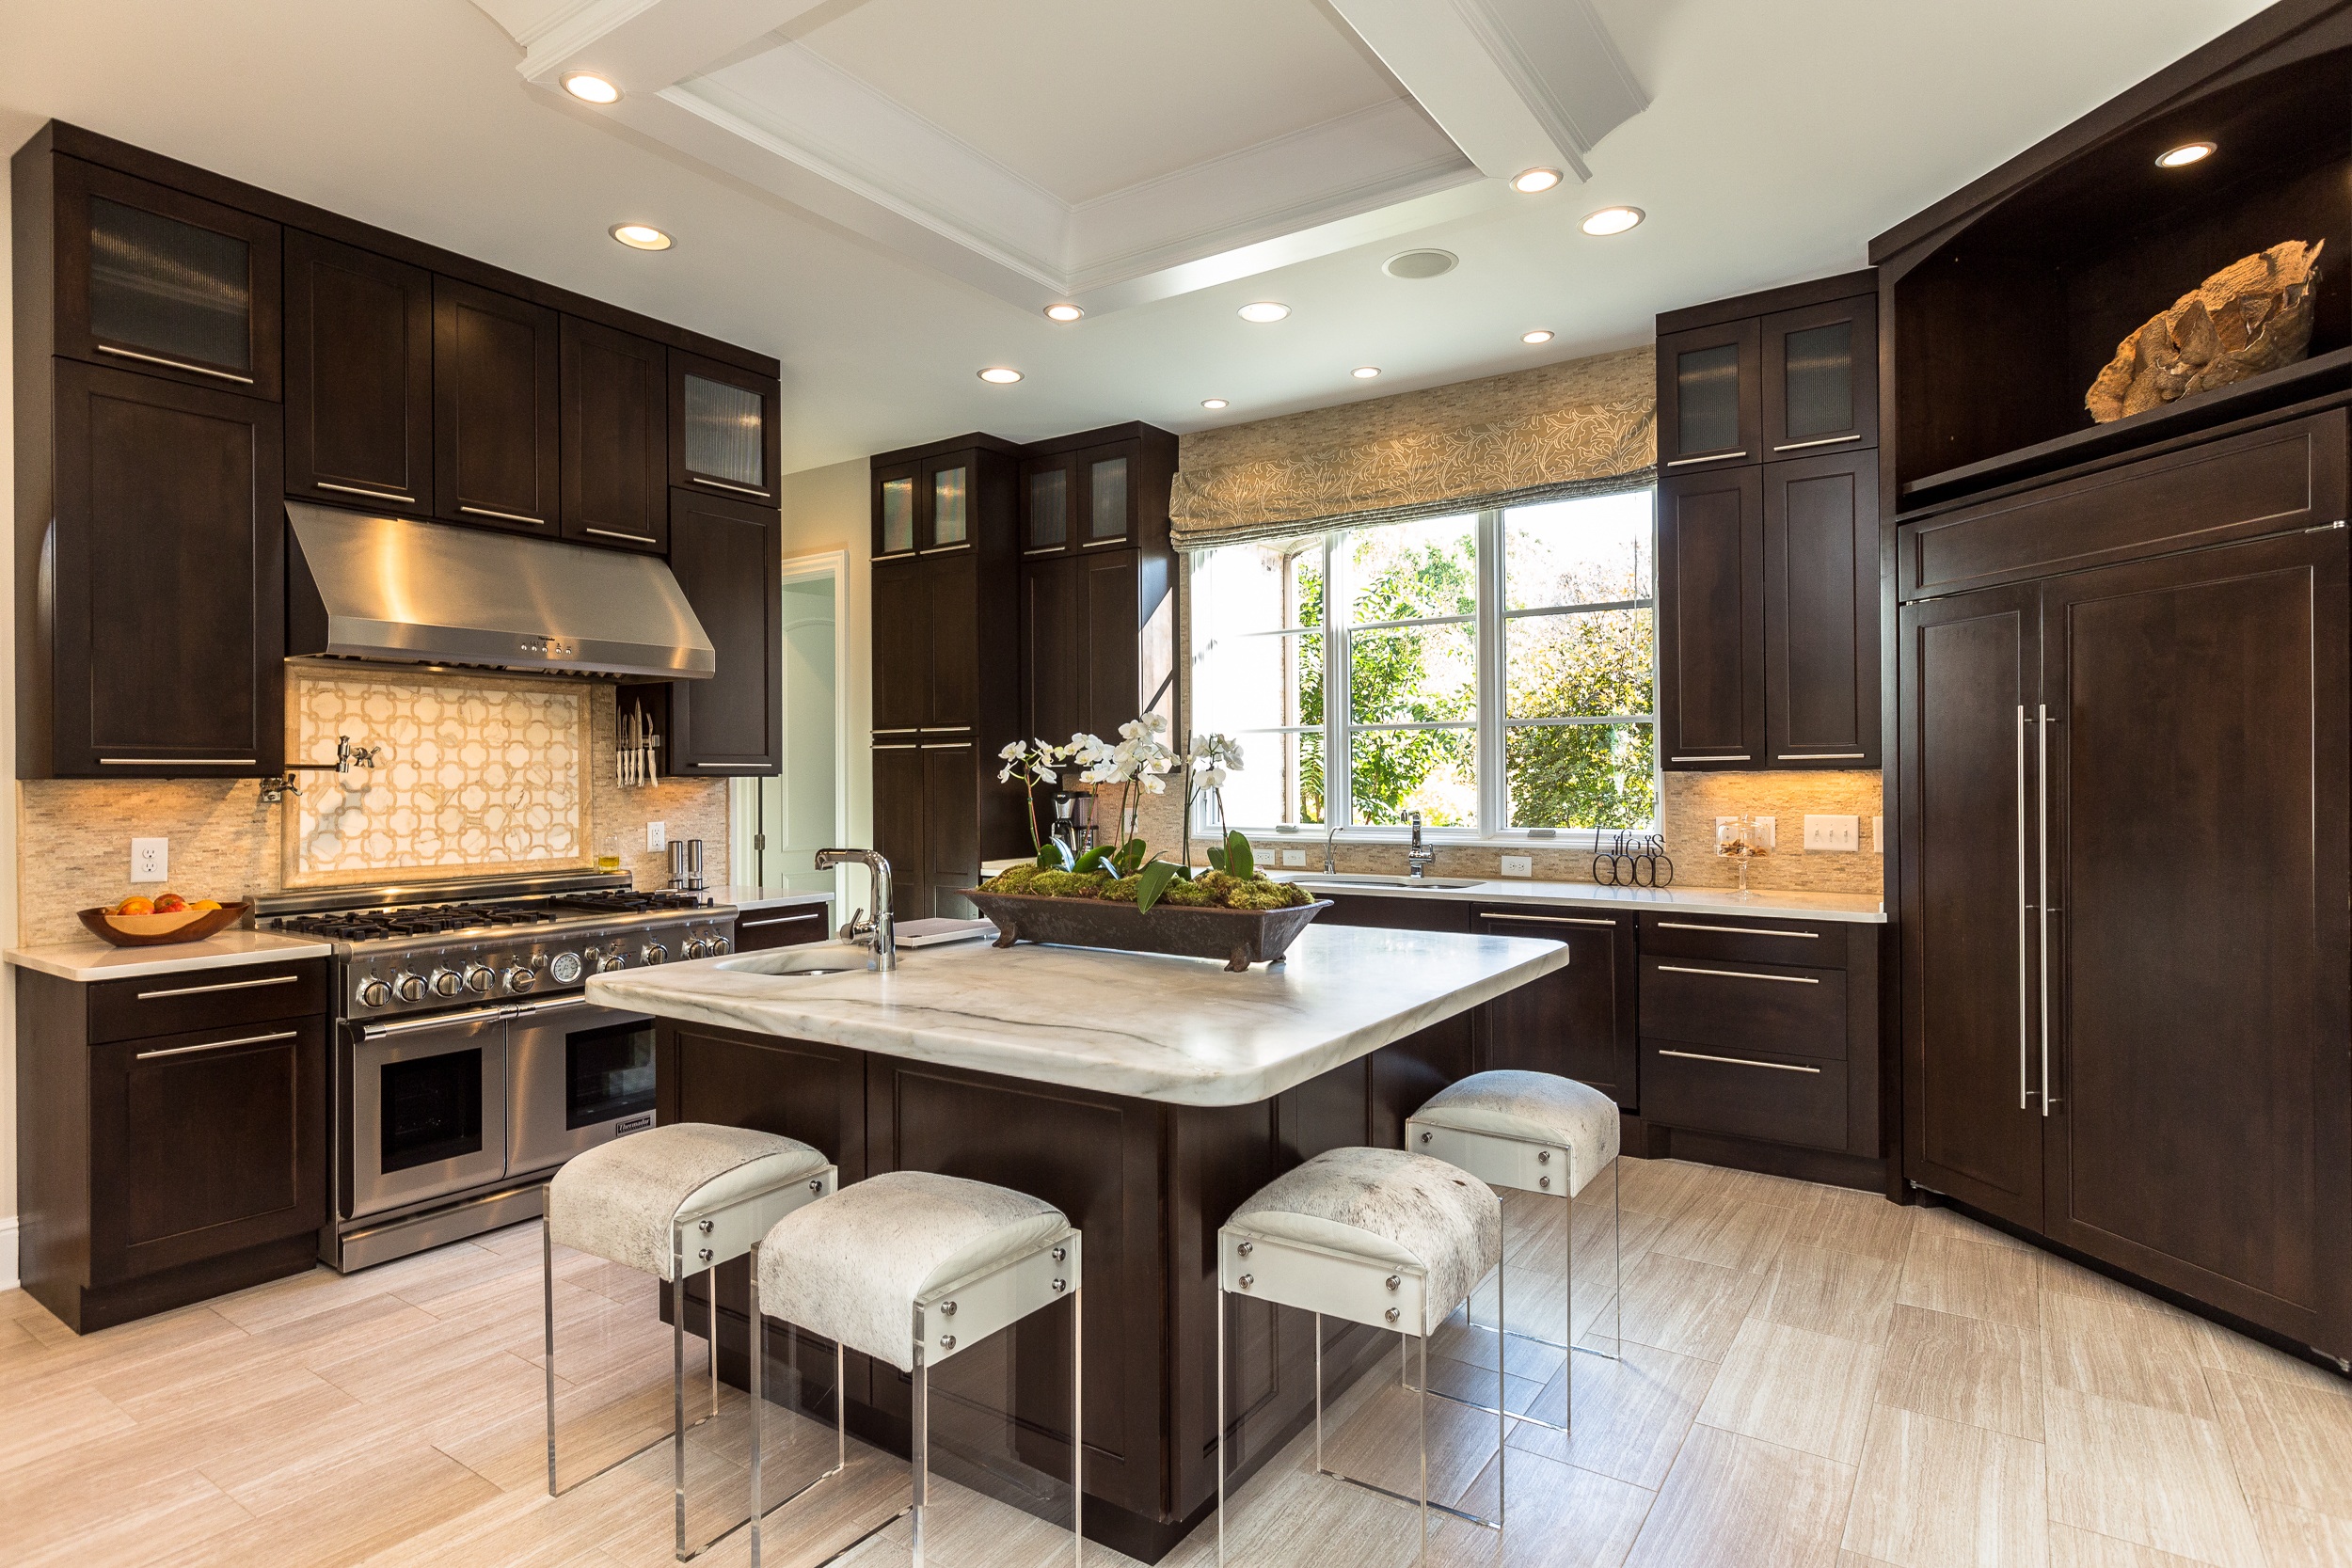 domophotos high standard real estate photography - Franklin, TN custom kitchen